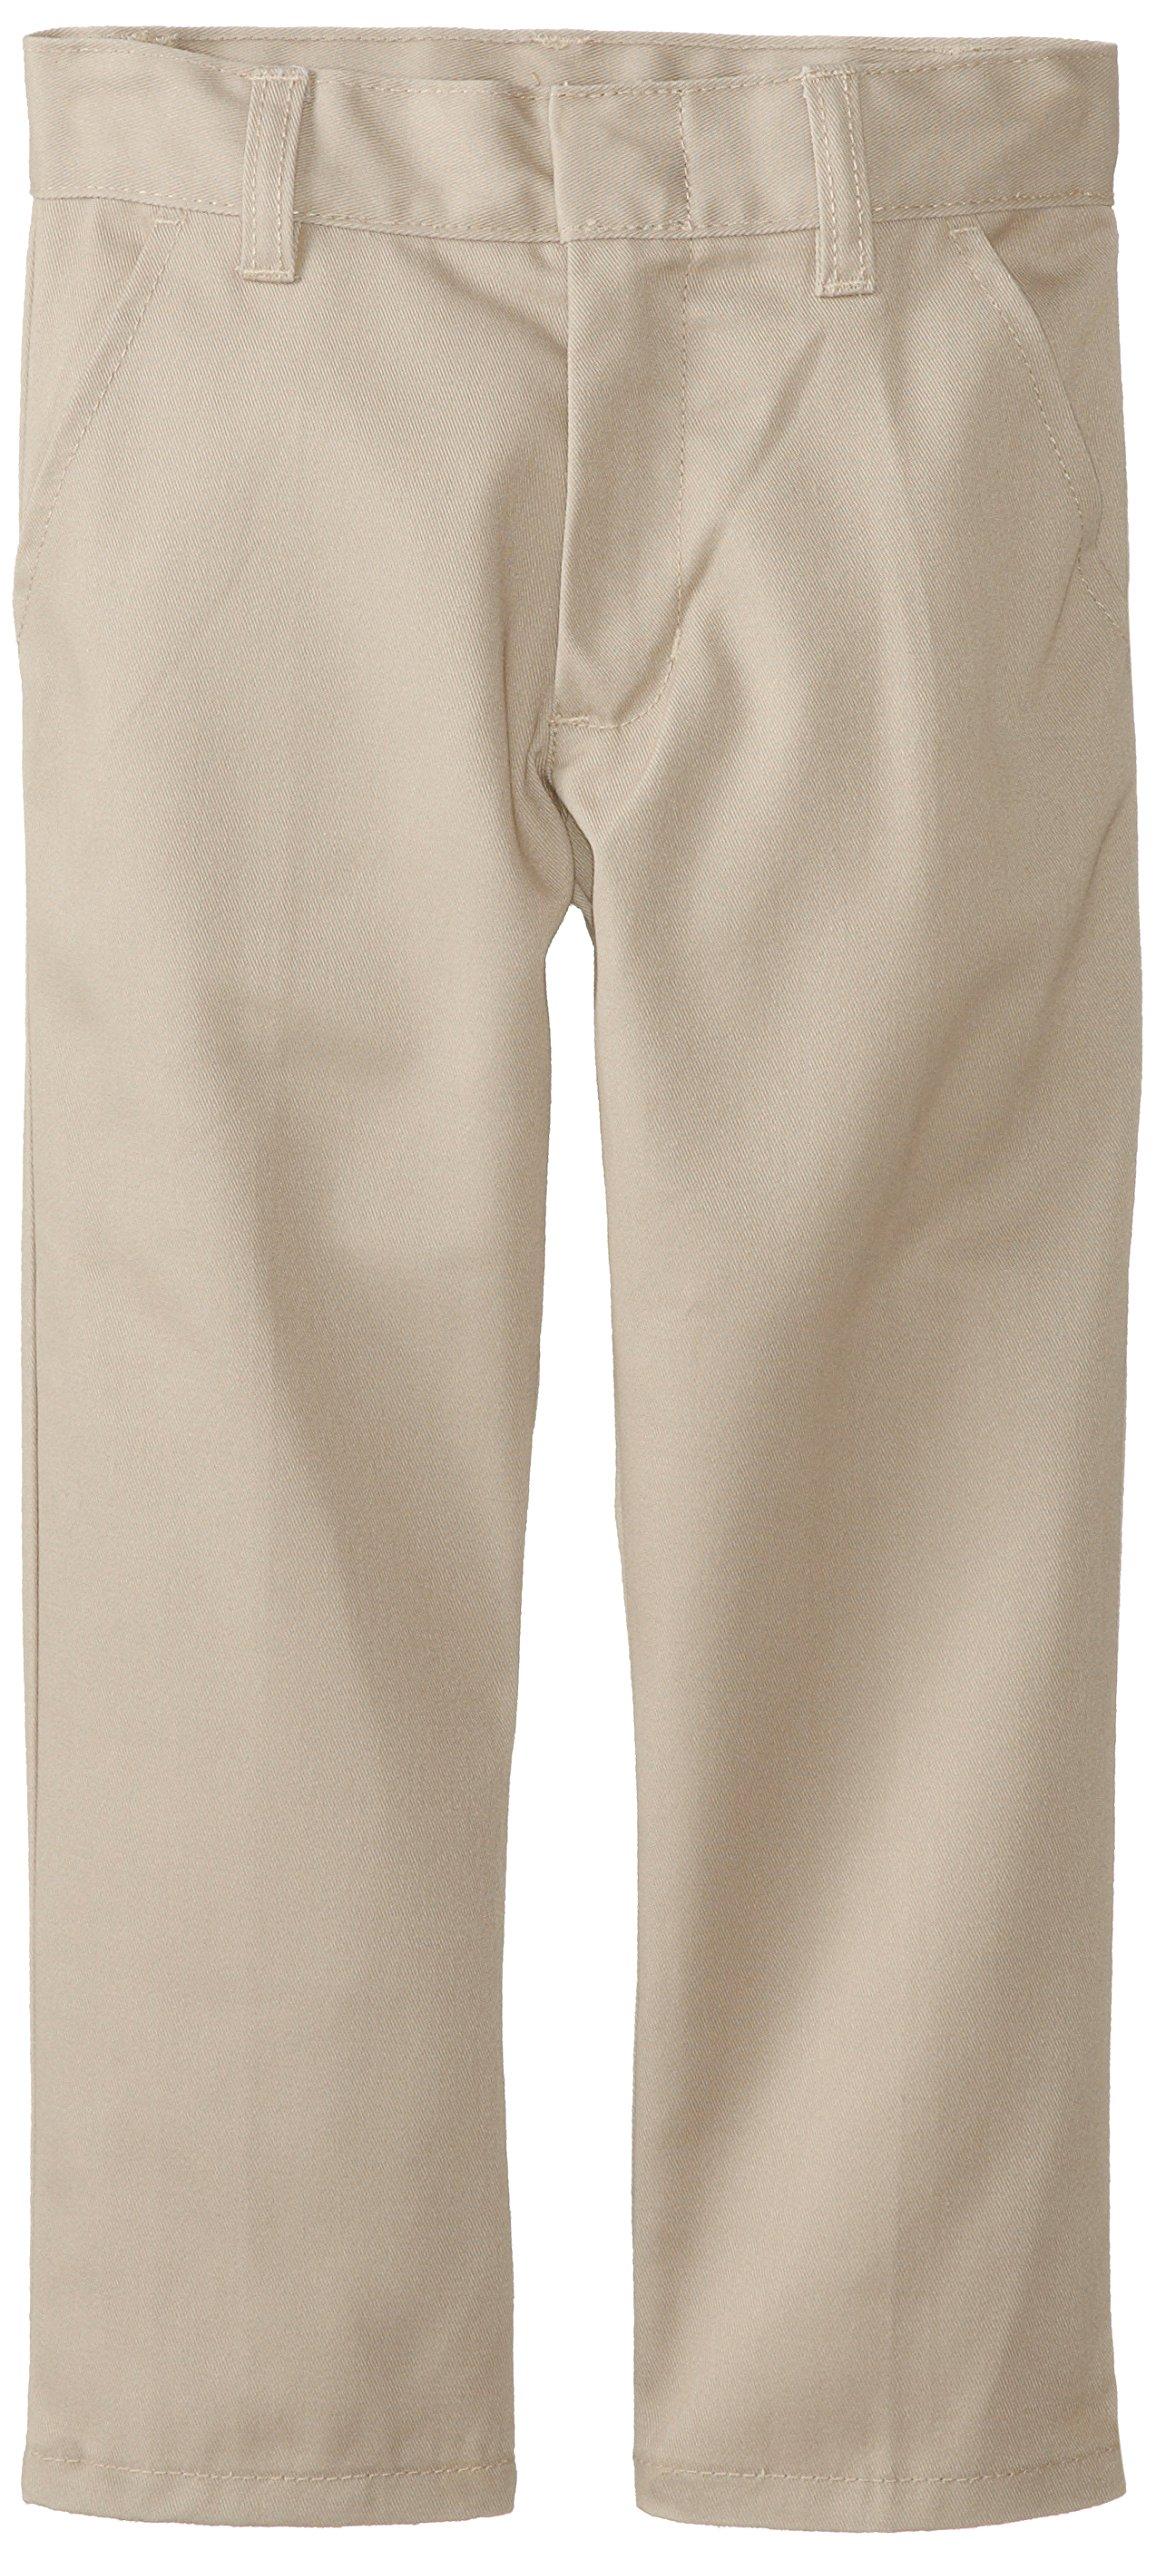 Genuine School Uniform Boys Twill Pant (More Styles Available), Basic Khaki, 5